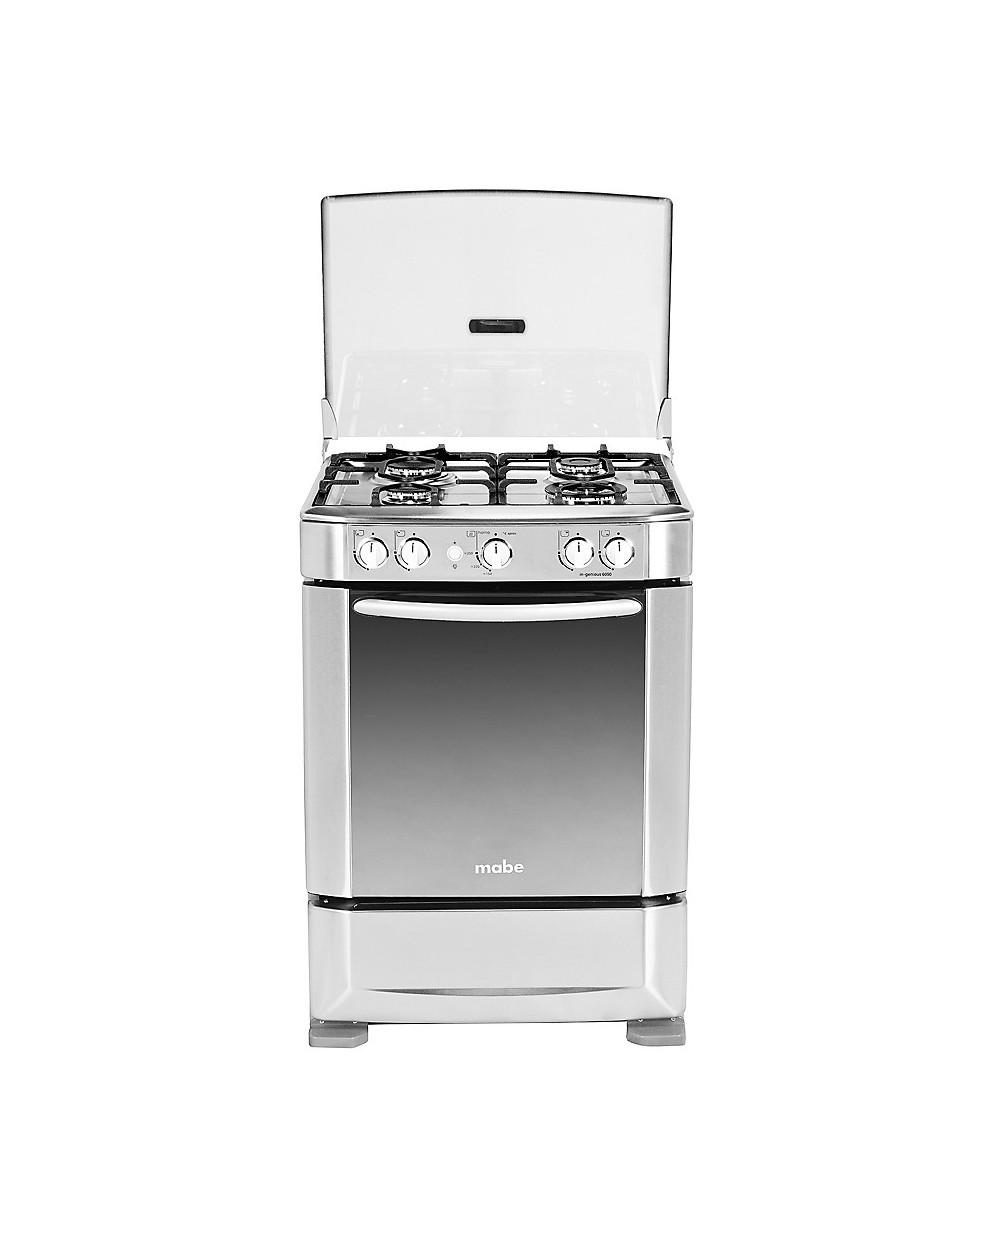 Mabe cocina ingenious 6050 px